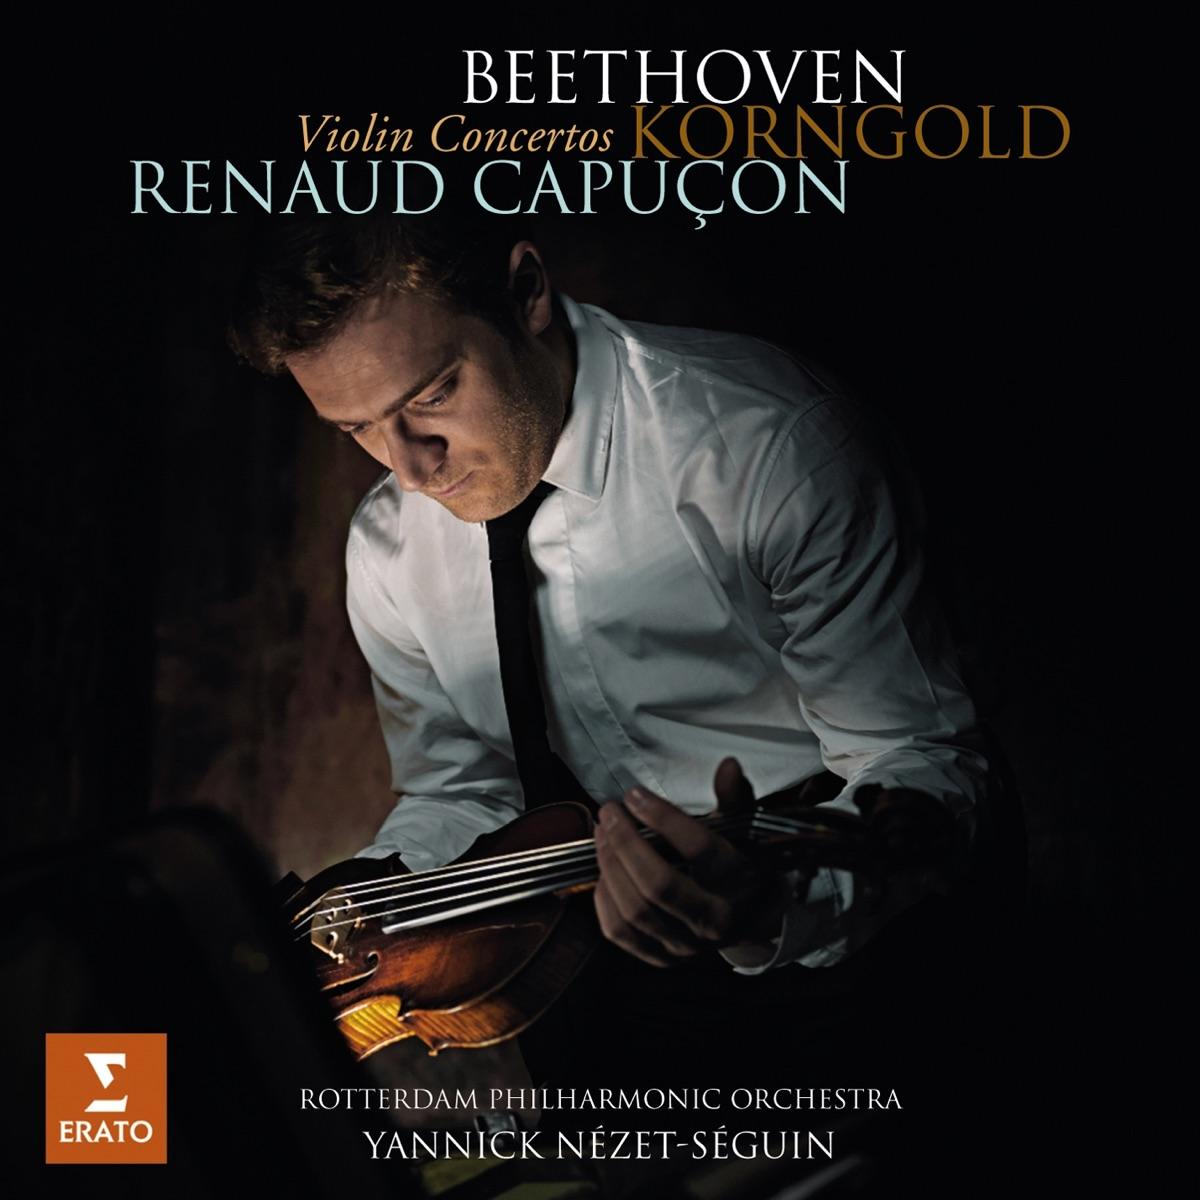 Beethoven  Korngold Violin Concertos Renaud Capuçon Rotterdam Philharmonic Orchestra  Yannick Nézet-Séguin CD cover